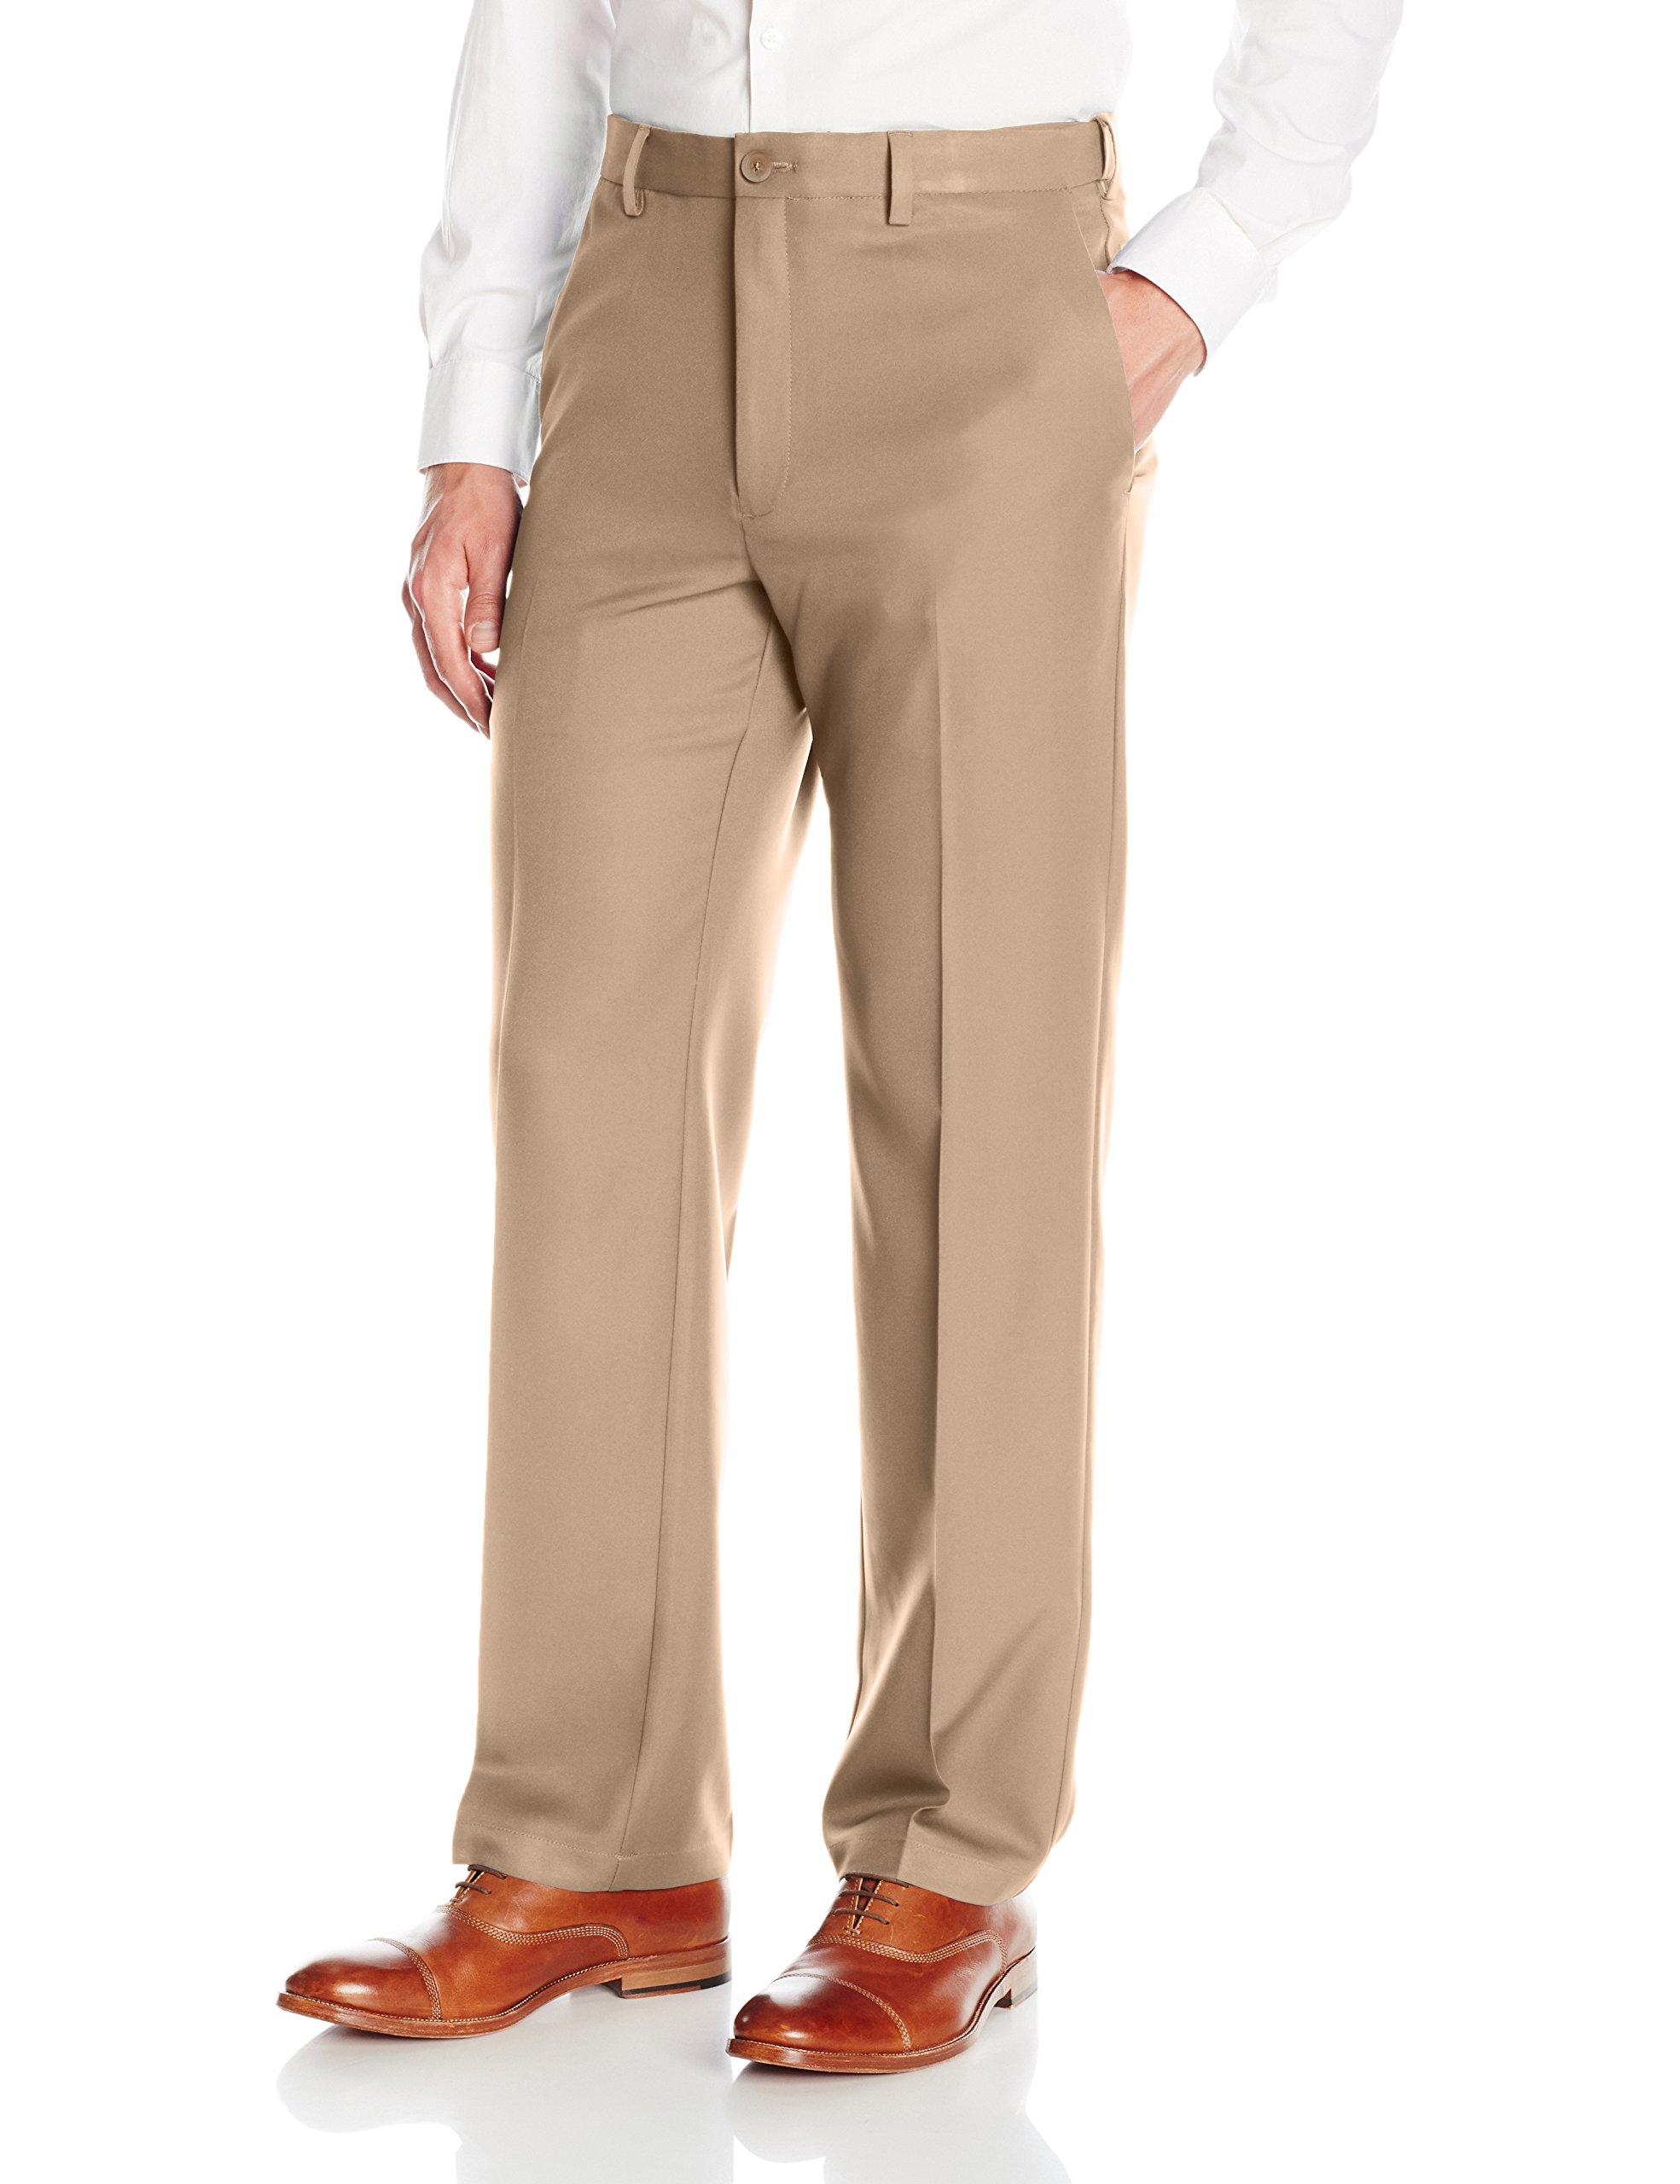 Haggar Men's Cool 18 Pro Classic Fit Flat Front Expandable Waist Pant, Khaki, 44Wx30L